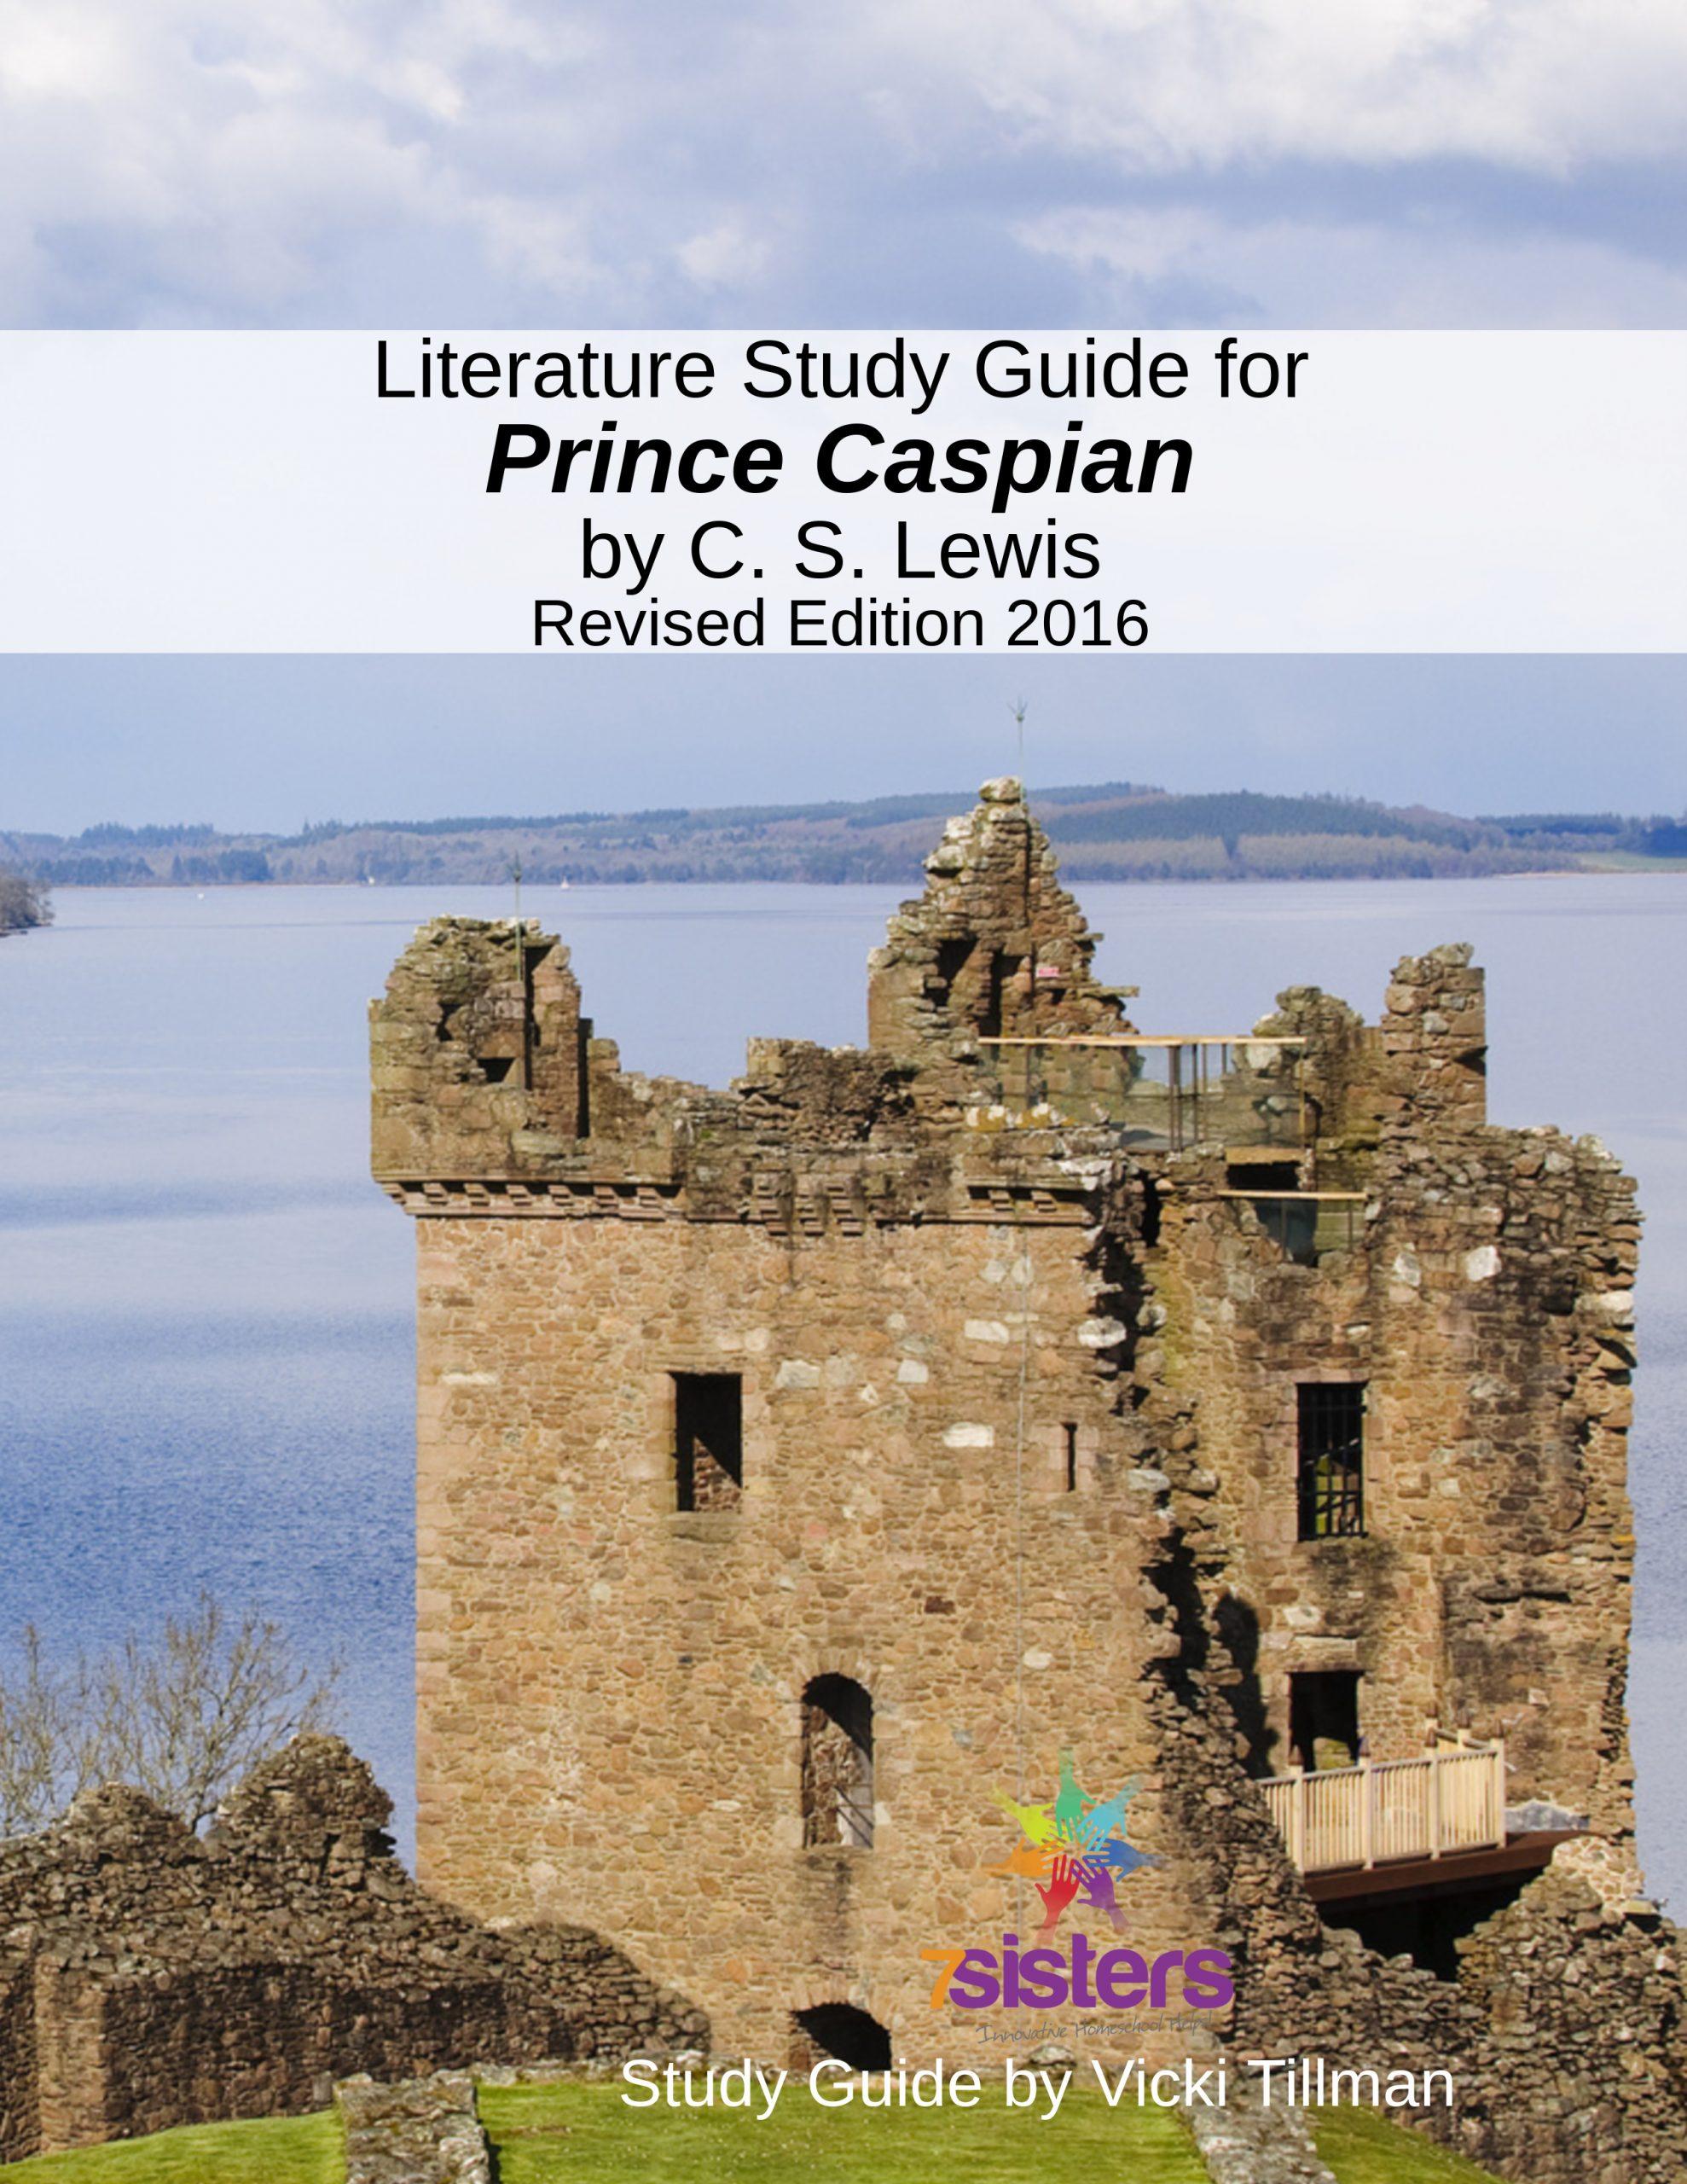 Prince Caspian Literature Study Guide